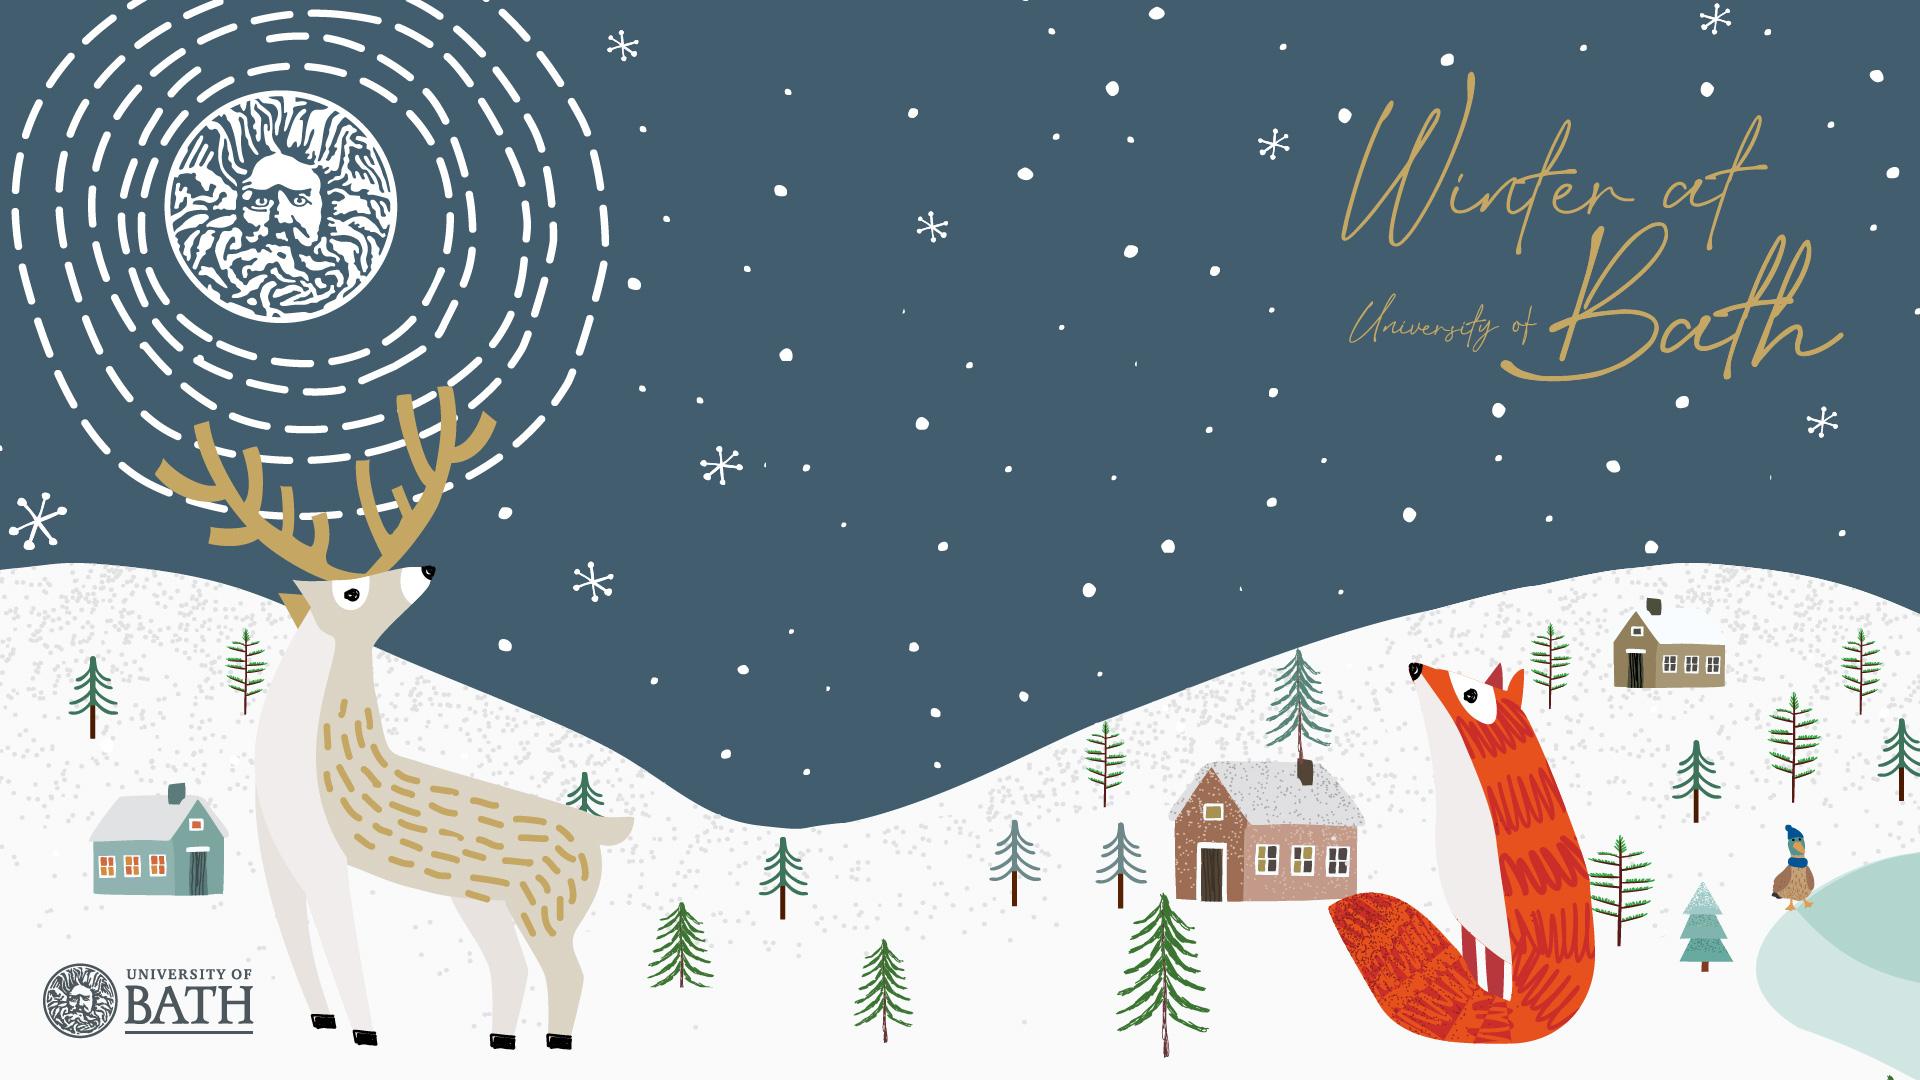 A cartoon fox and deer in a snowy scene